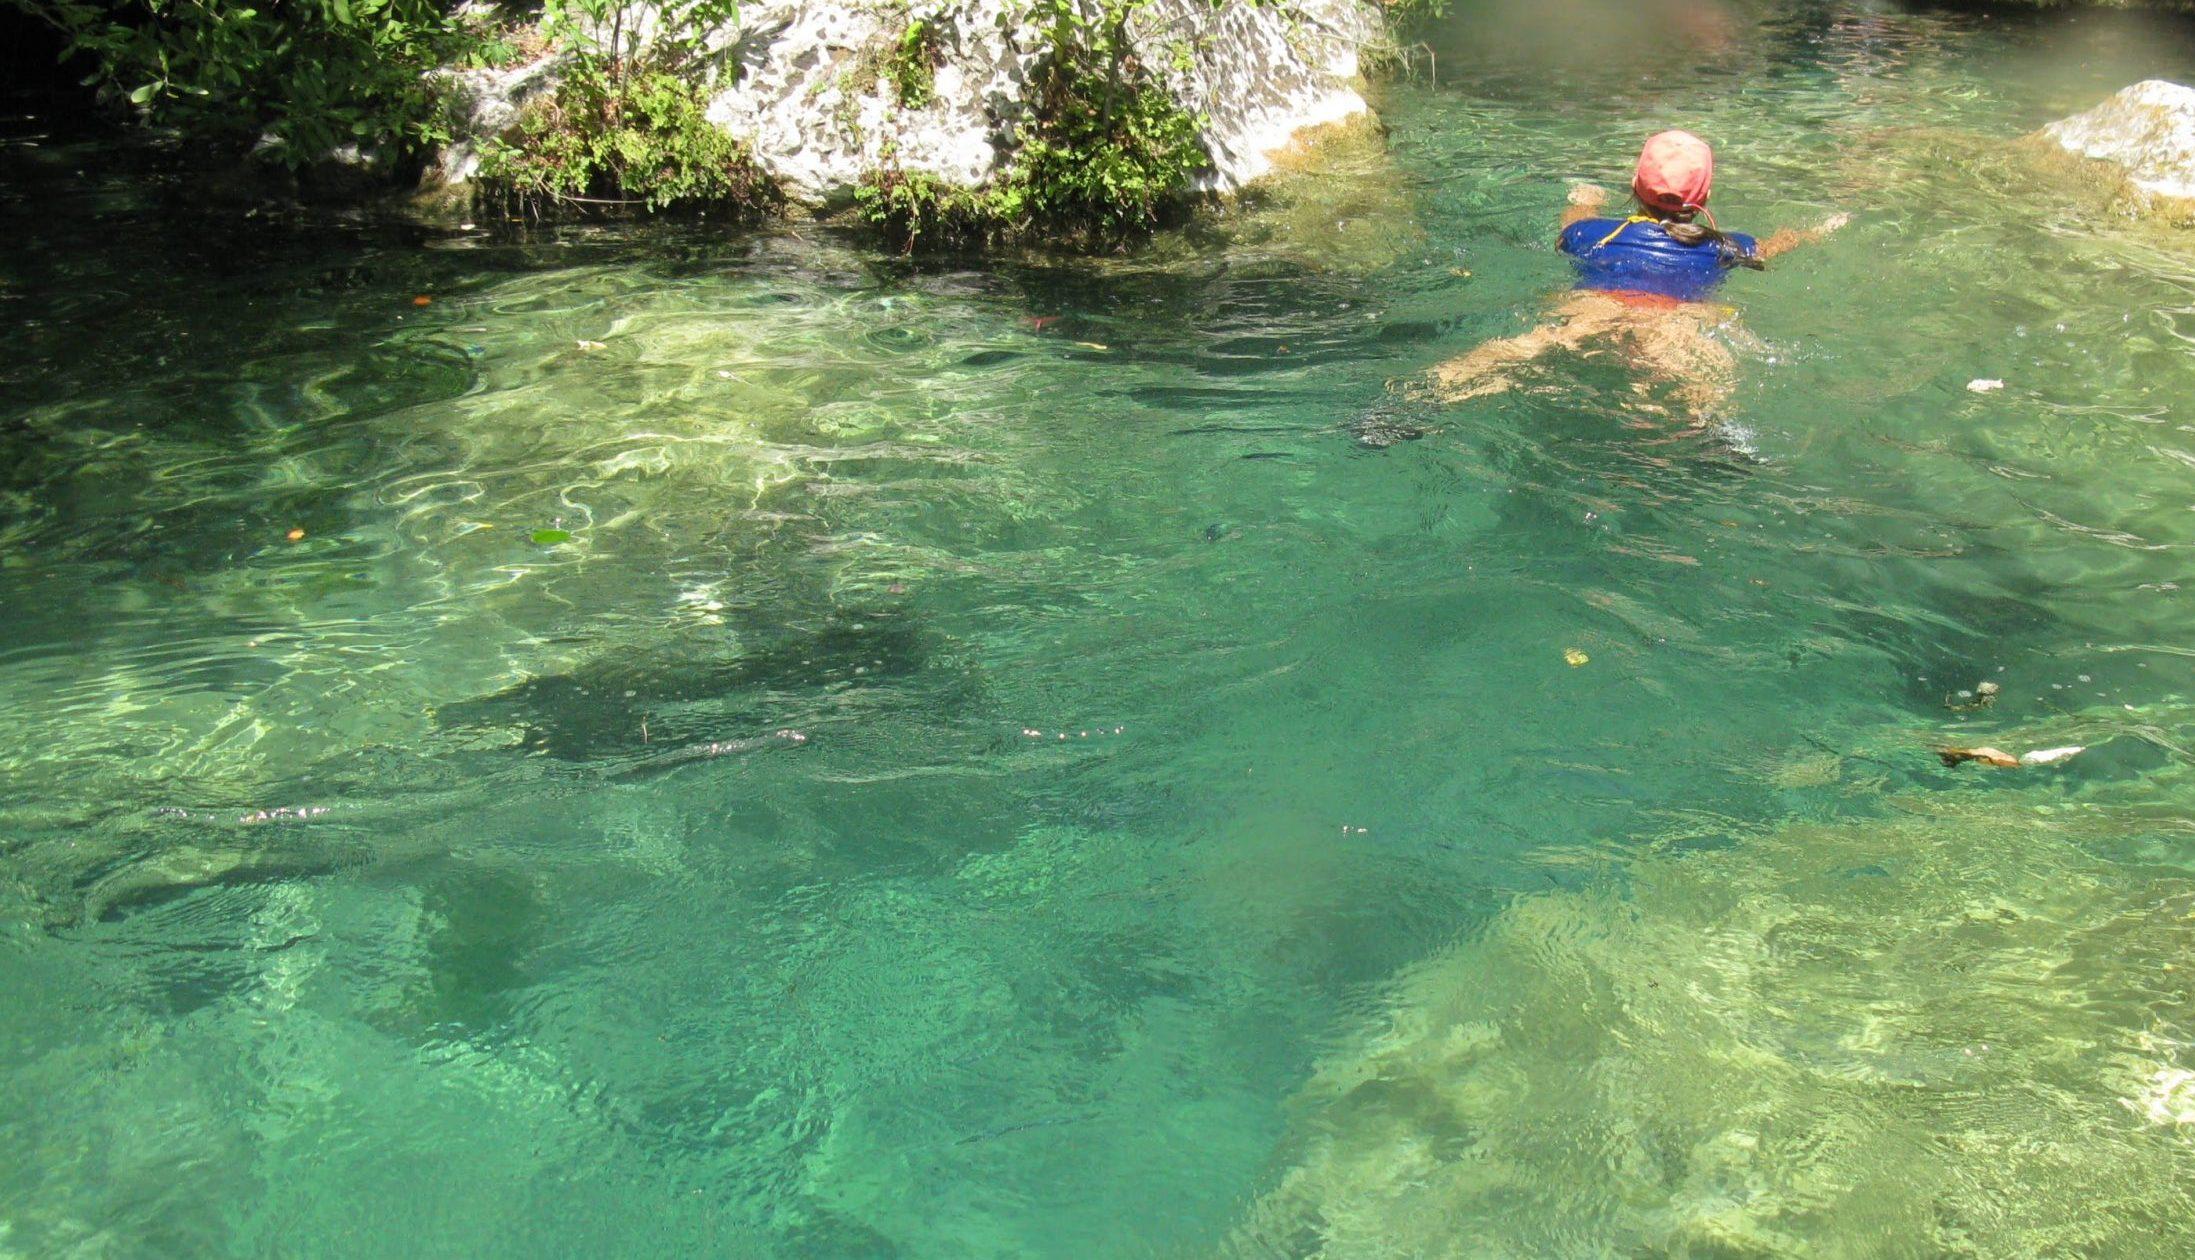 nuotando nelle acque limpide del torrente calcinara